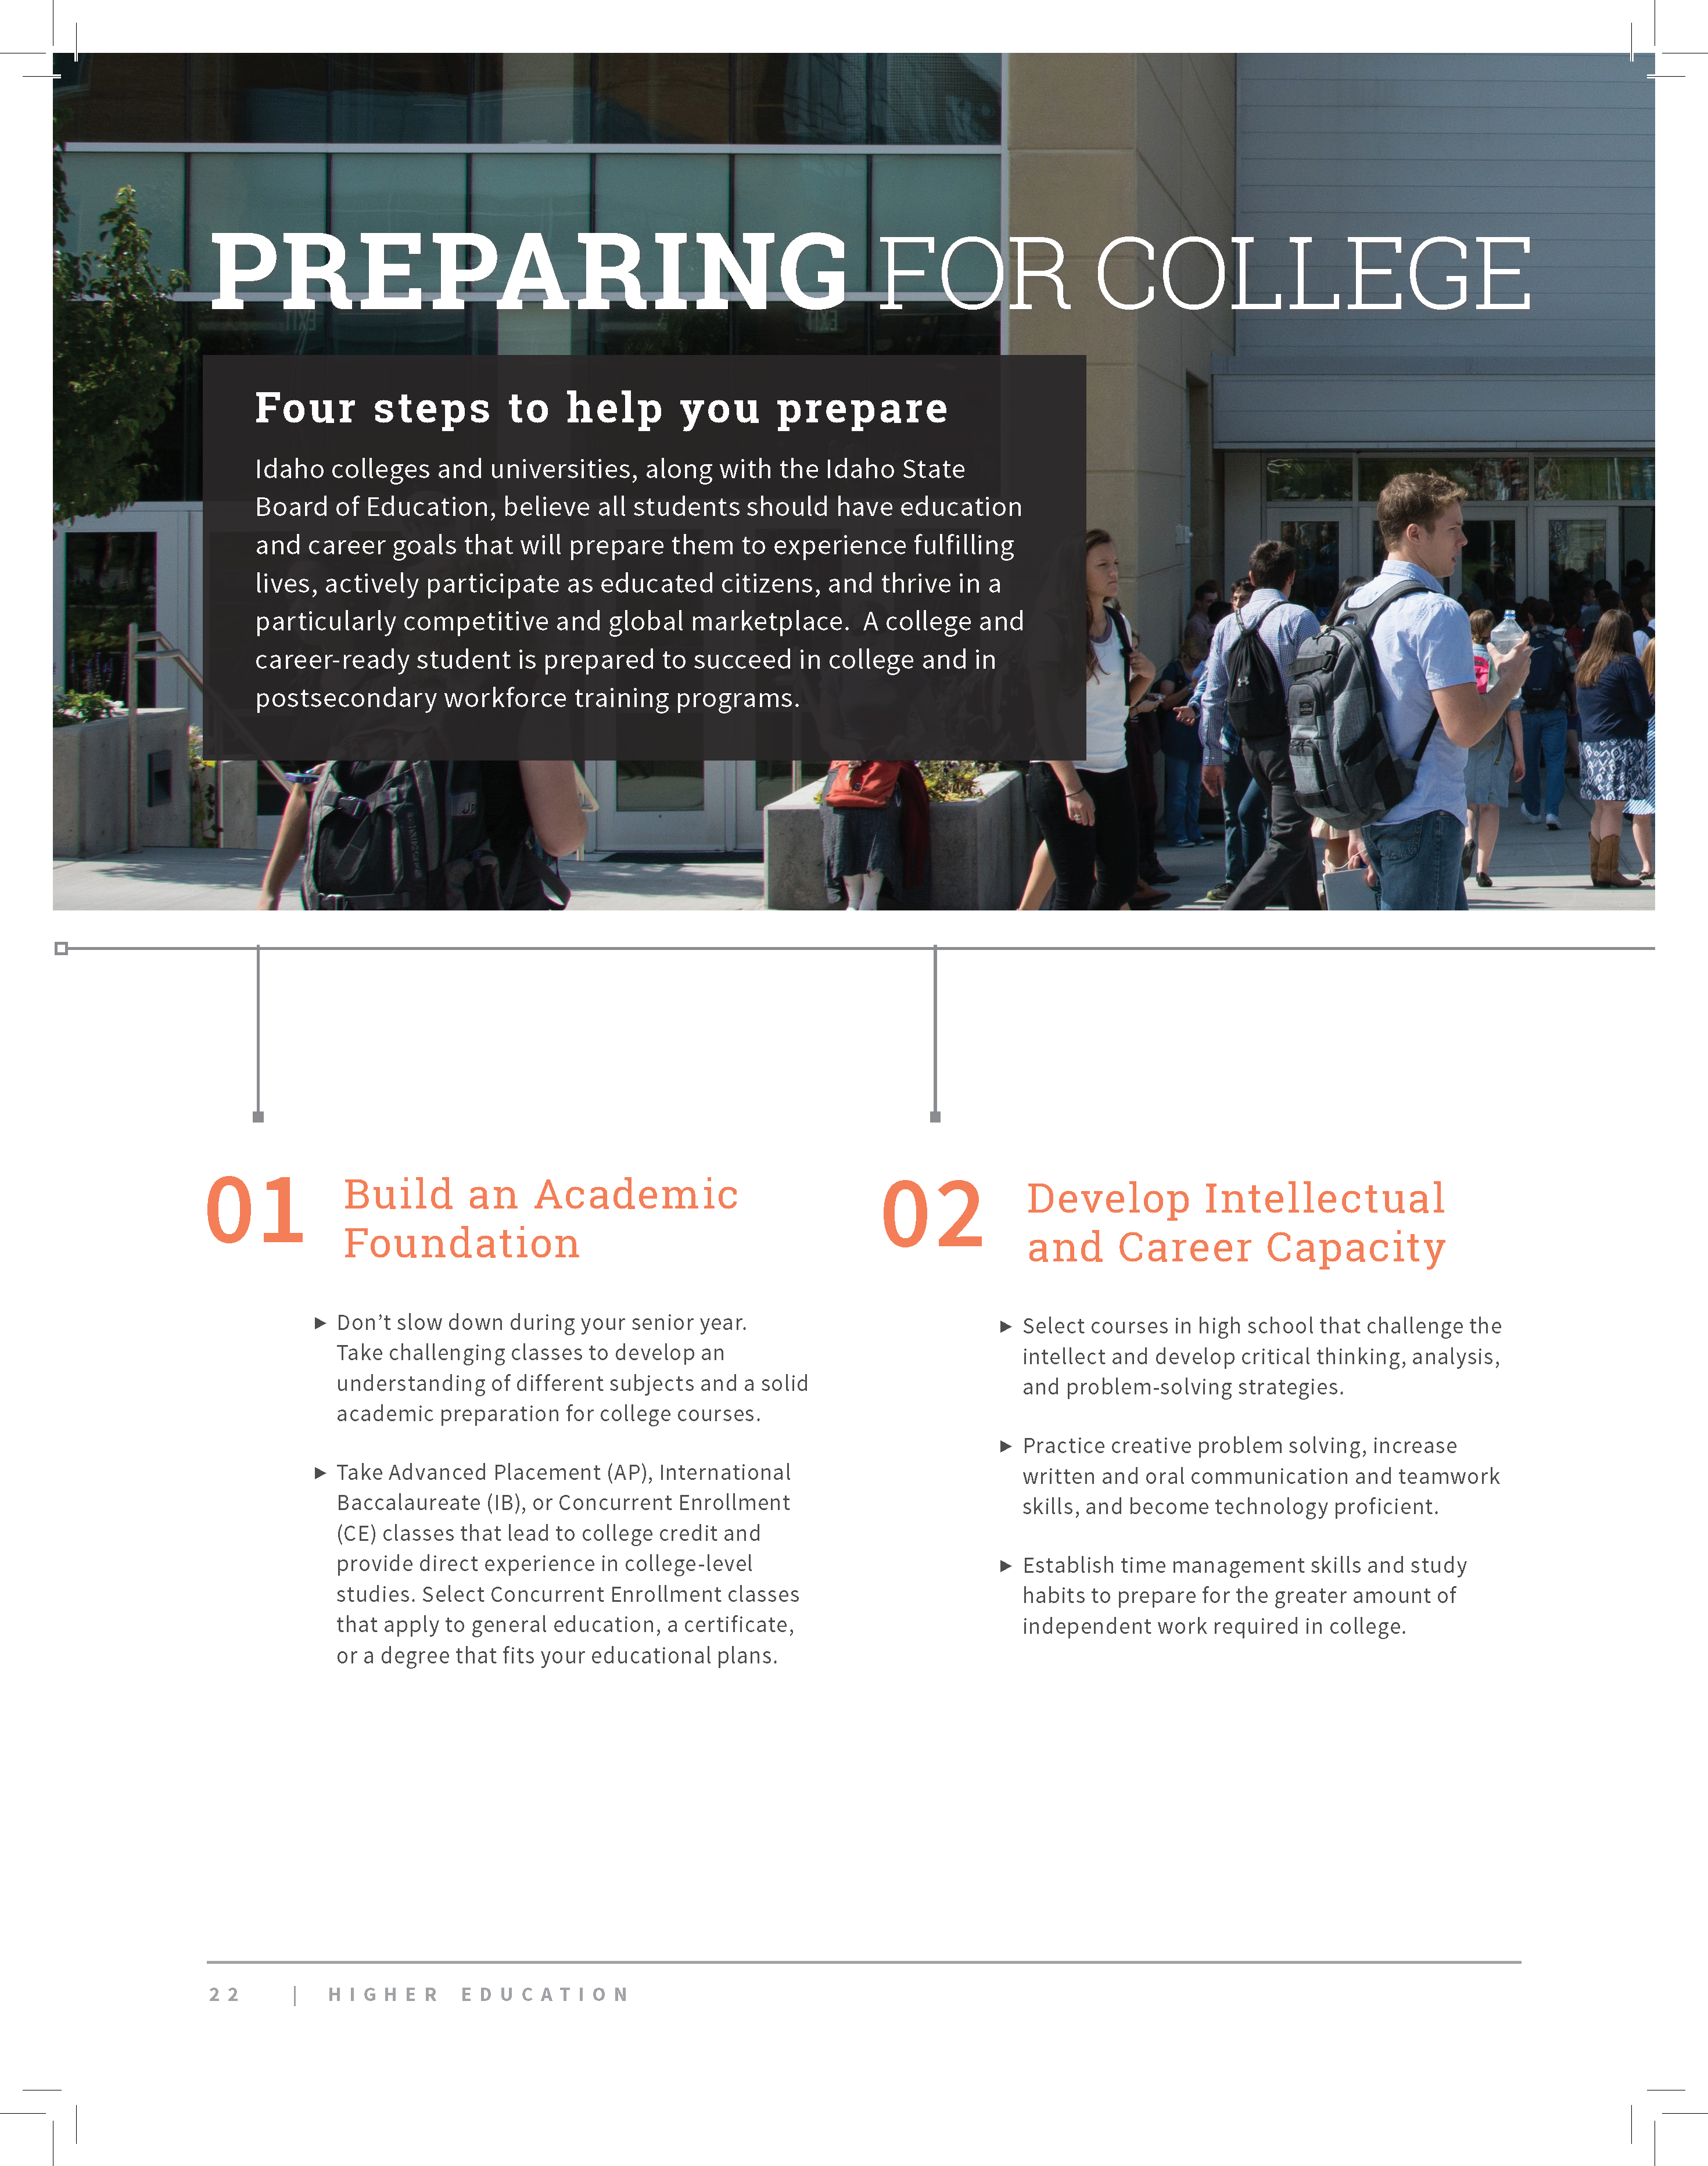 portfolio: higher education booklet – emma rose morgan, University Of Idaho Presentation Template, Presentation templates